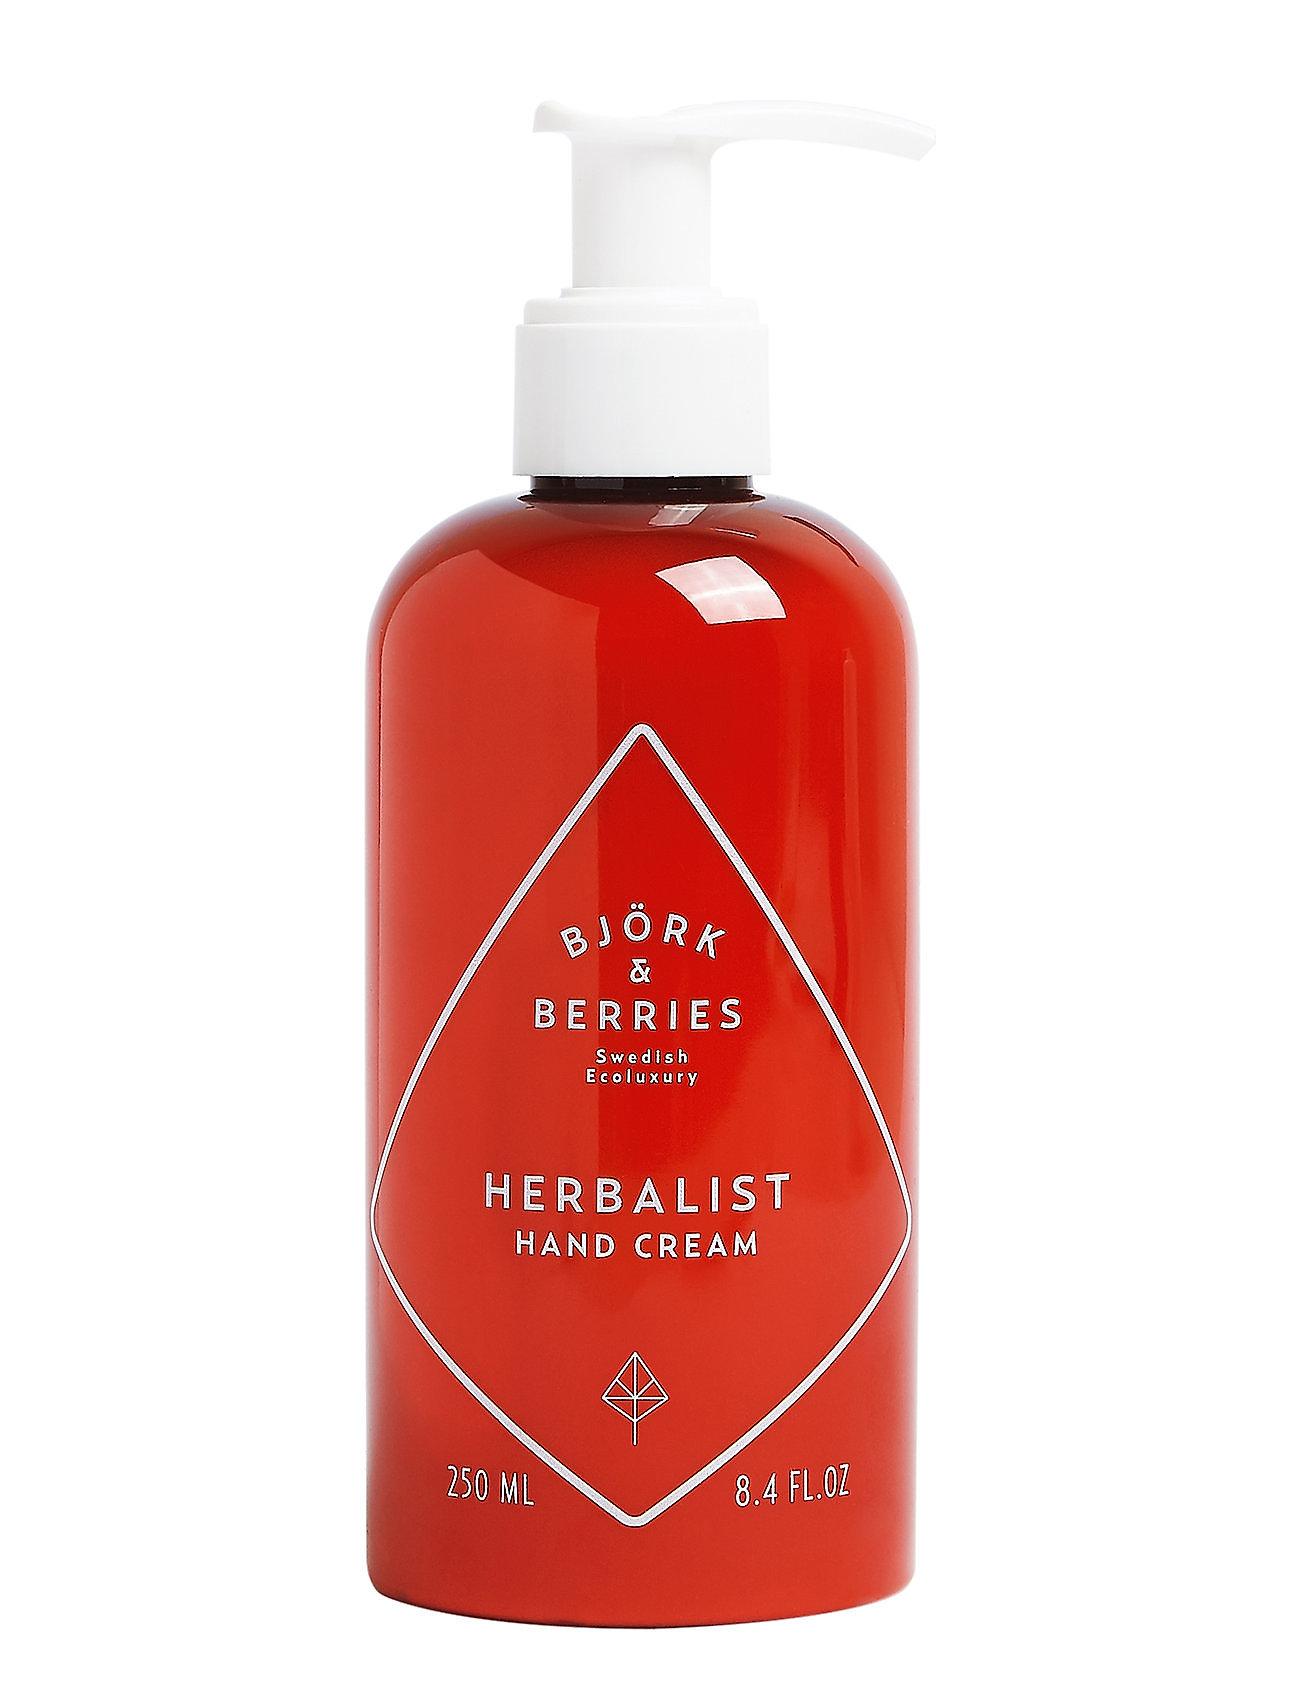 Image of Herbalist Hand Cream Beauty WOMEN Skin Care Hand Cream & Foot Cream Nude Björk & Berries (3176748317)